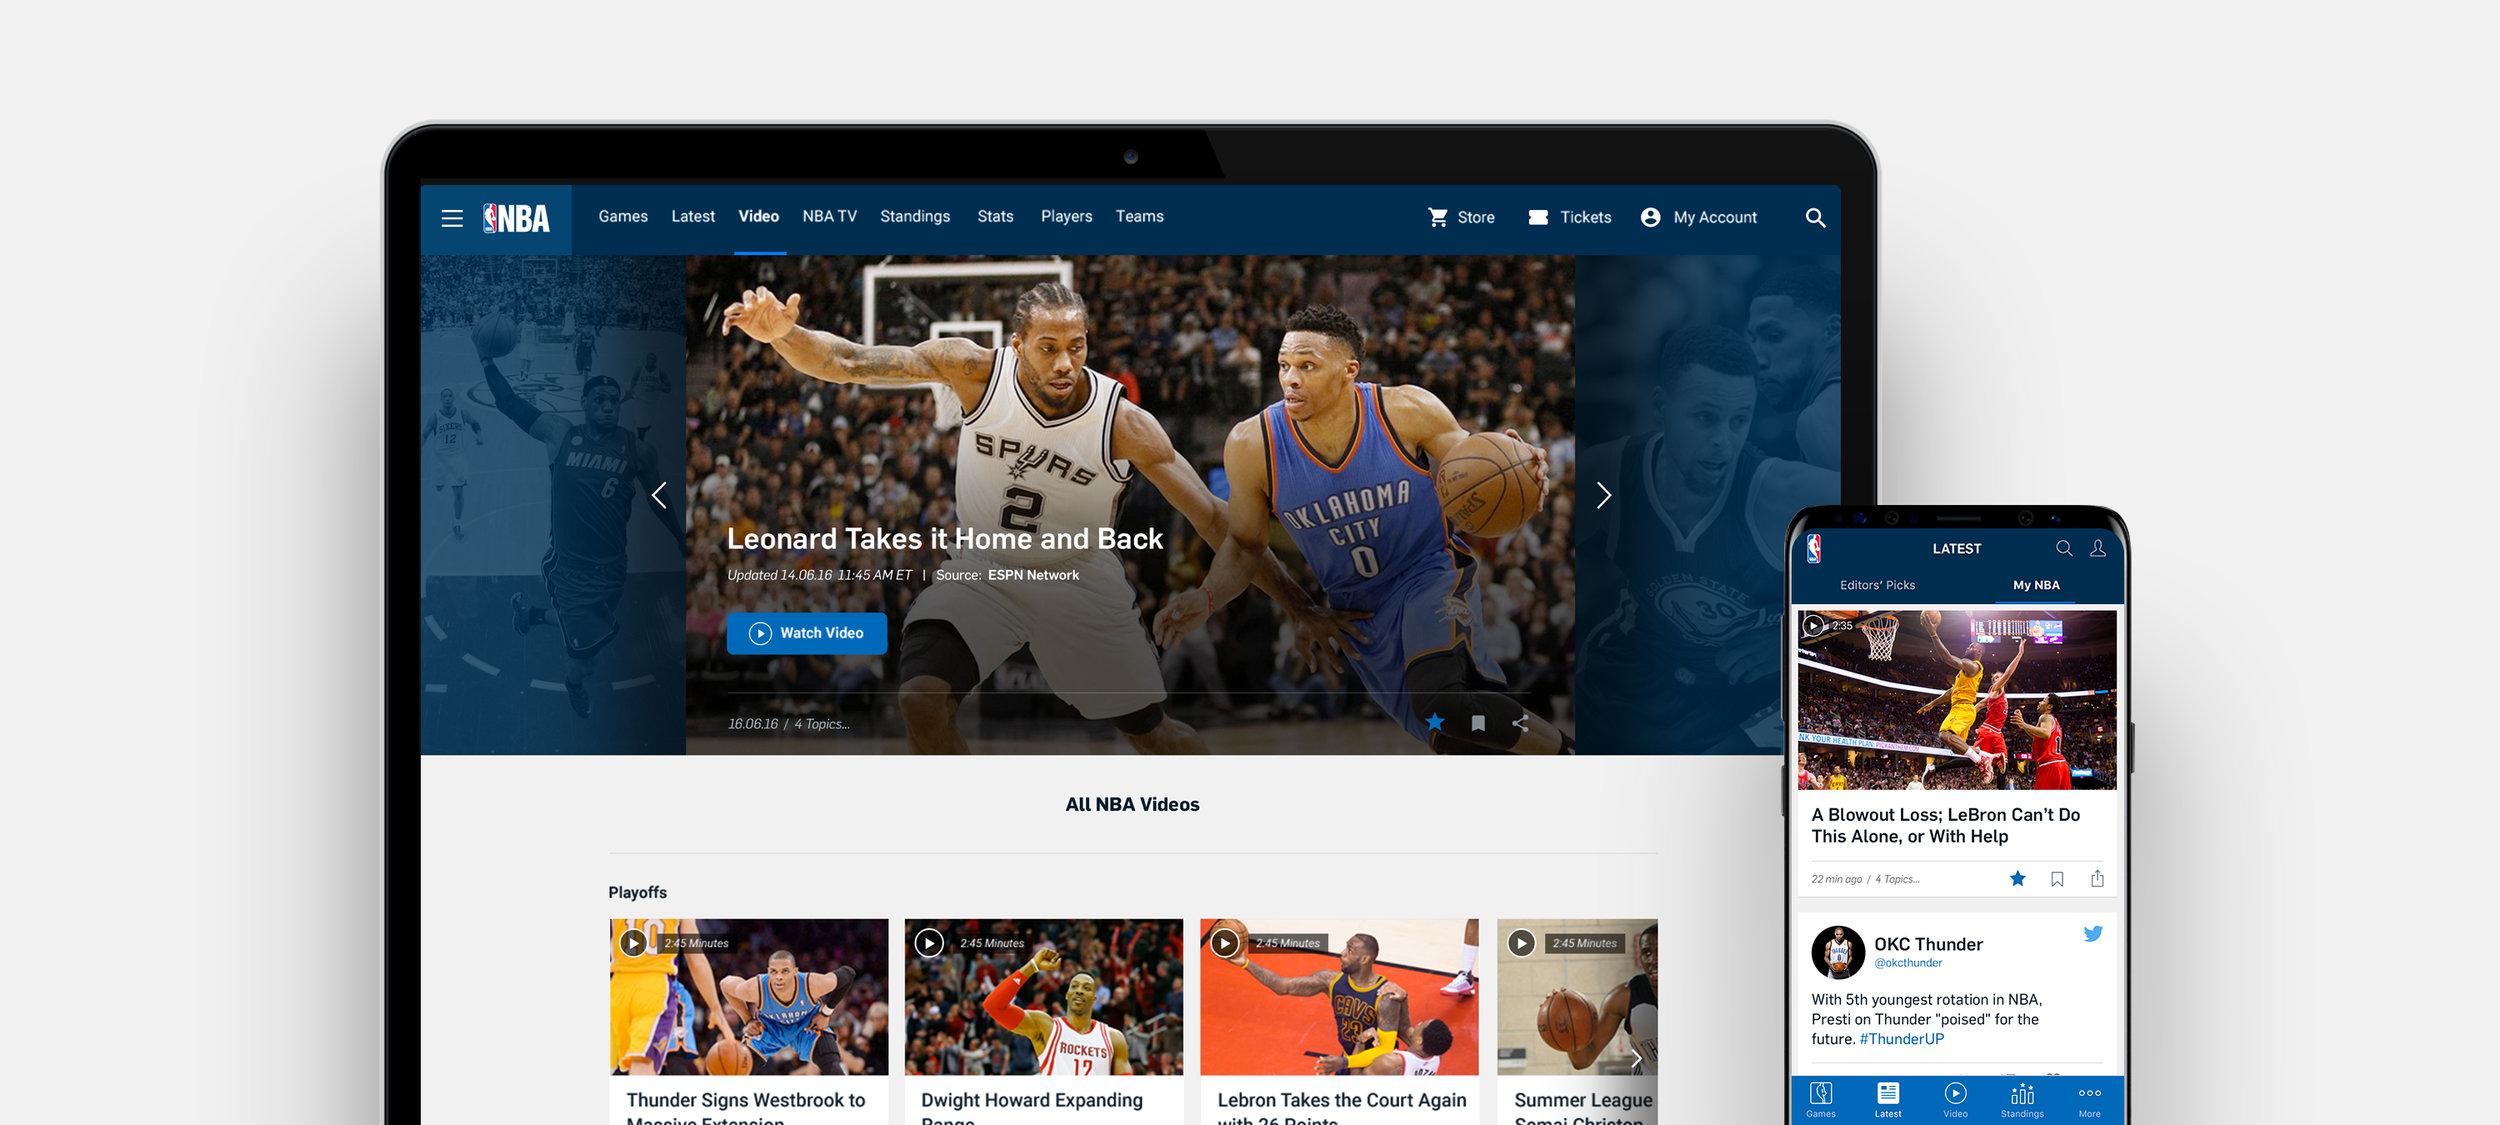 Main-Image-NBA.jpg